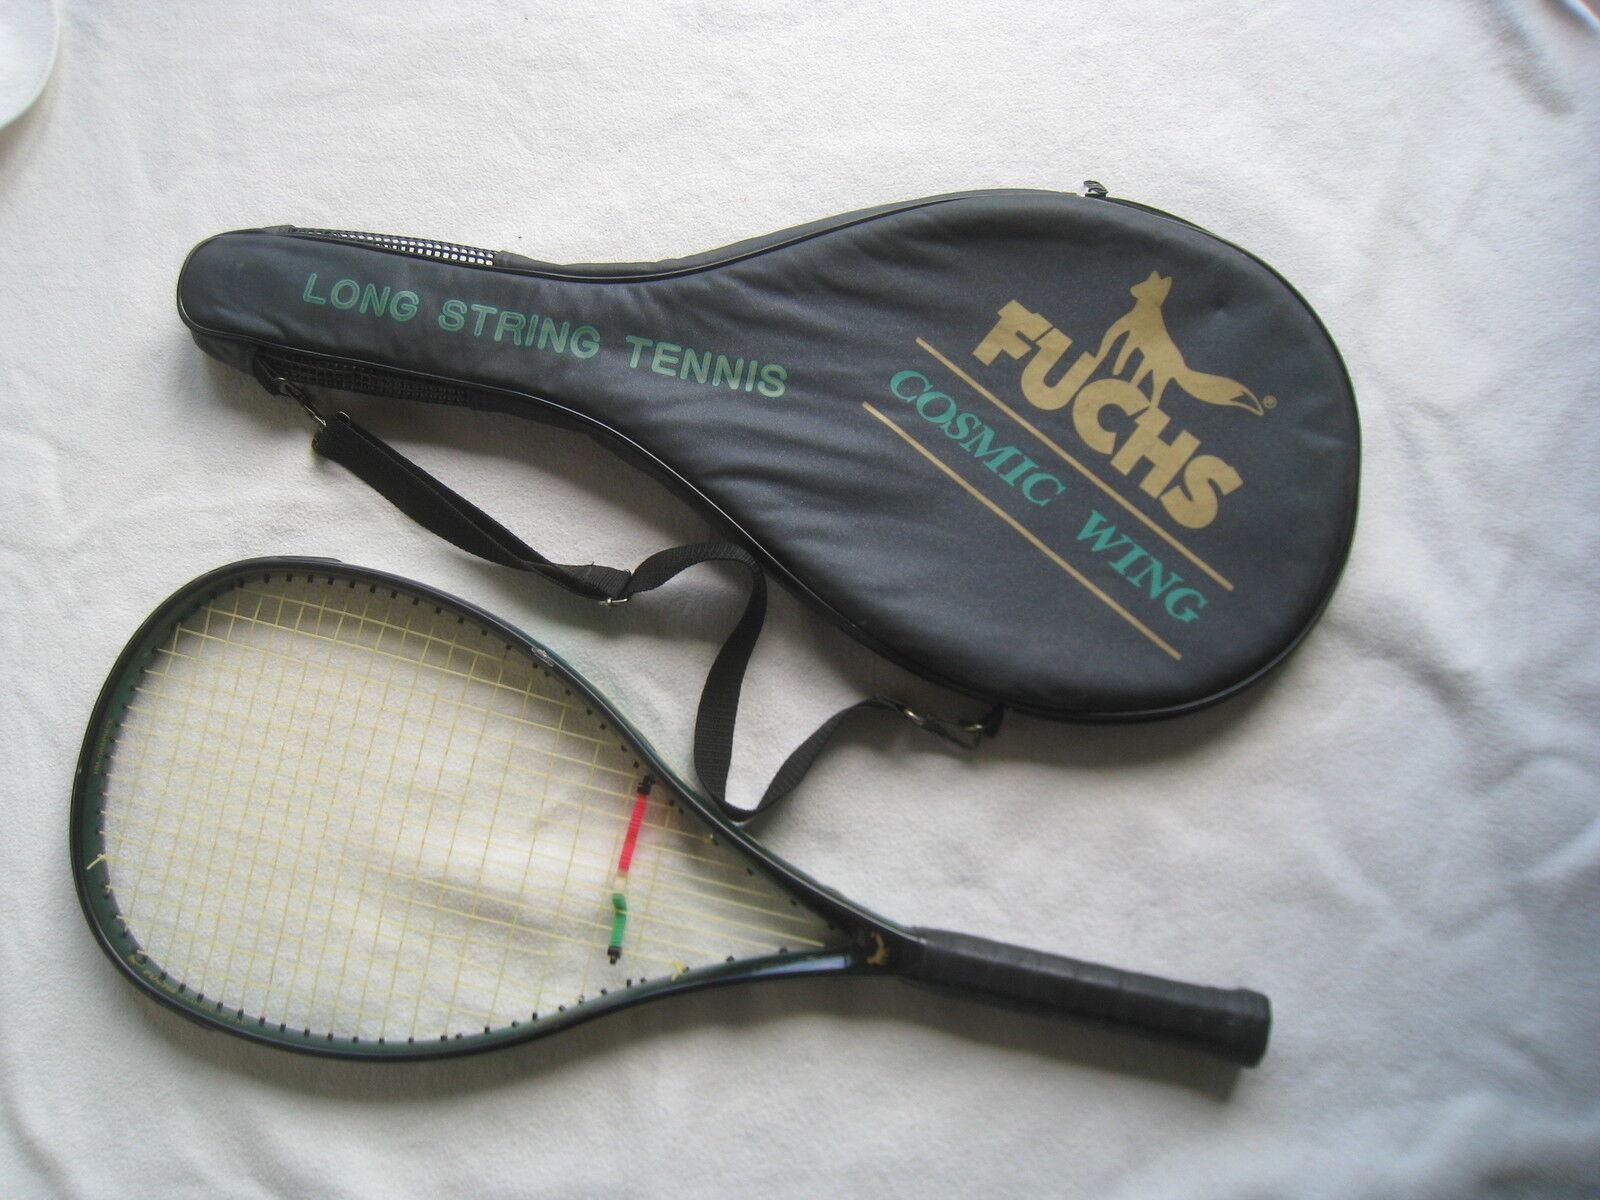 Fuchs Cosmic Wing HM  Graphite Graphite Graphite   - Tennis Badmington Schläger d55351